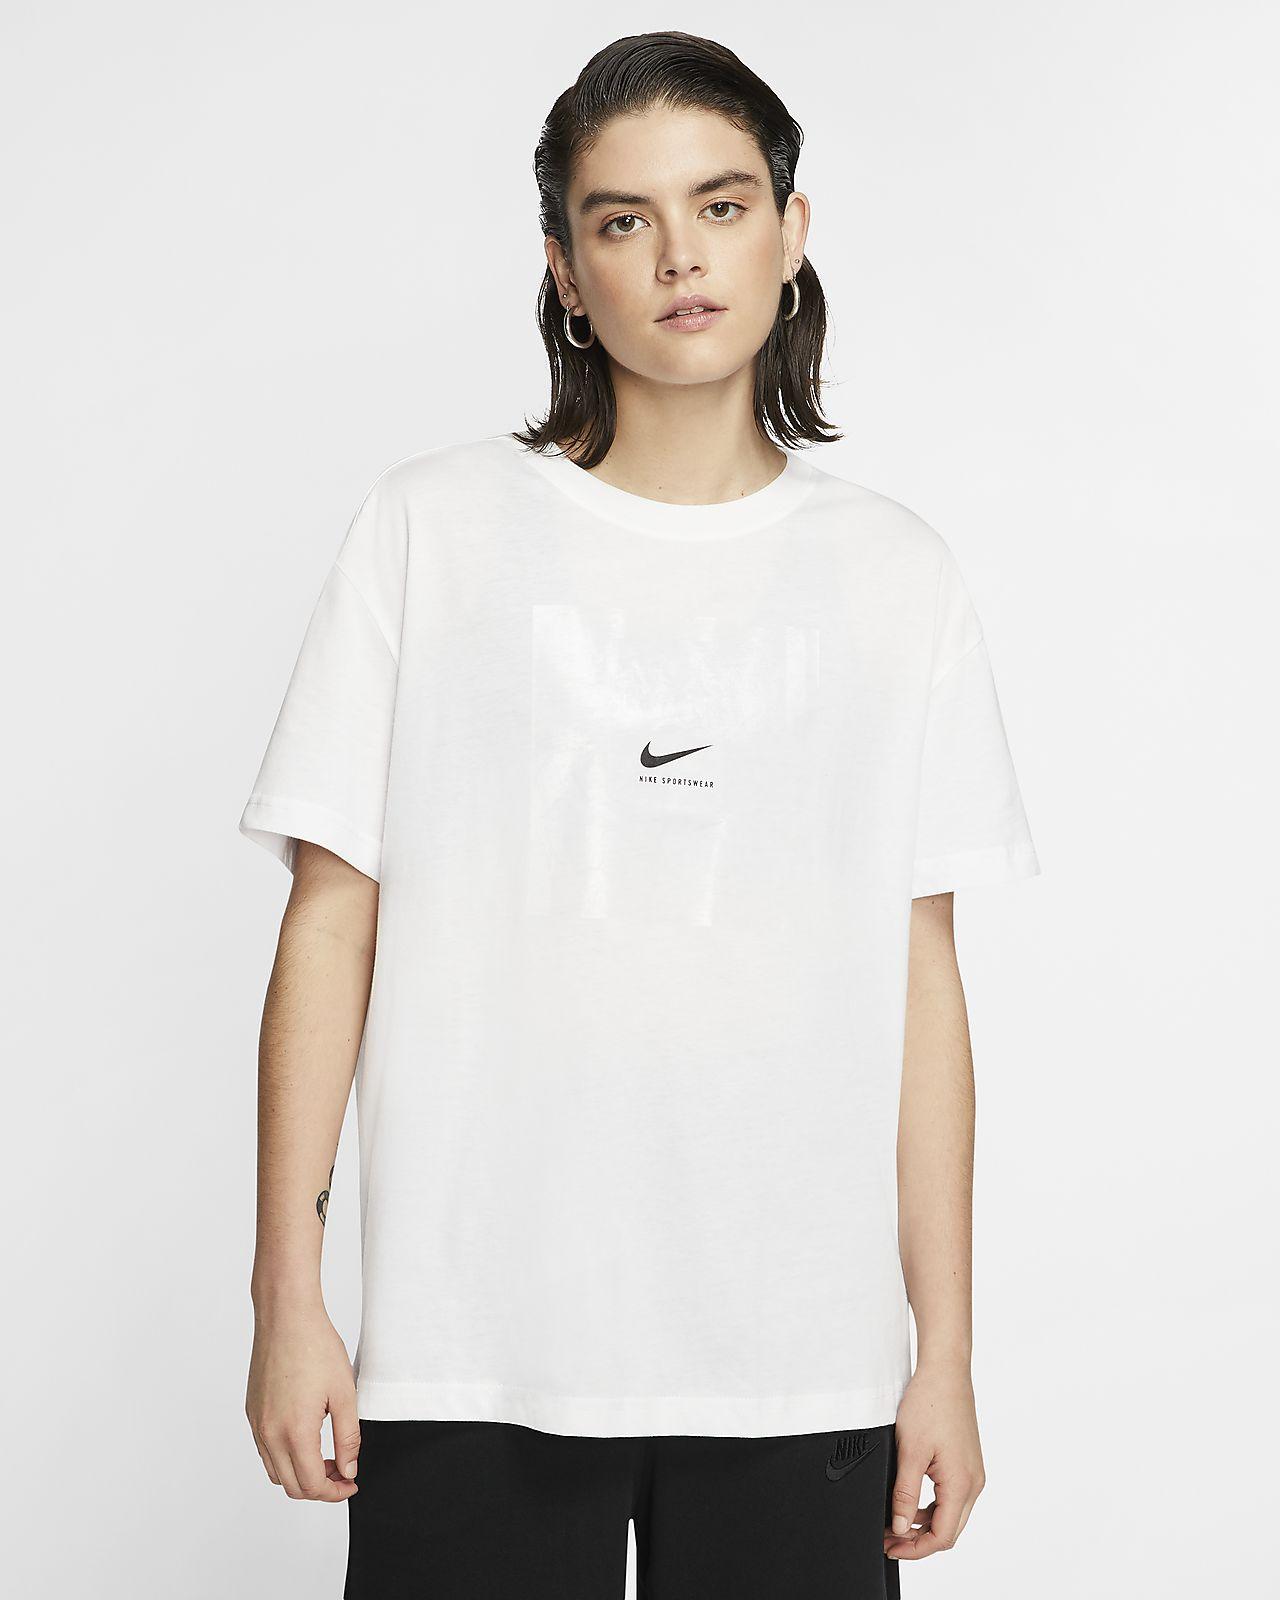 Nike Sportswear T shirt til kvinder